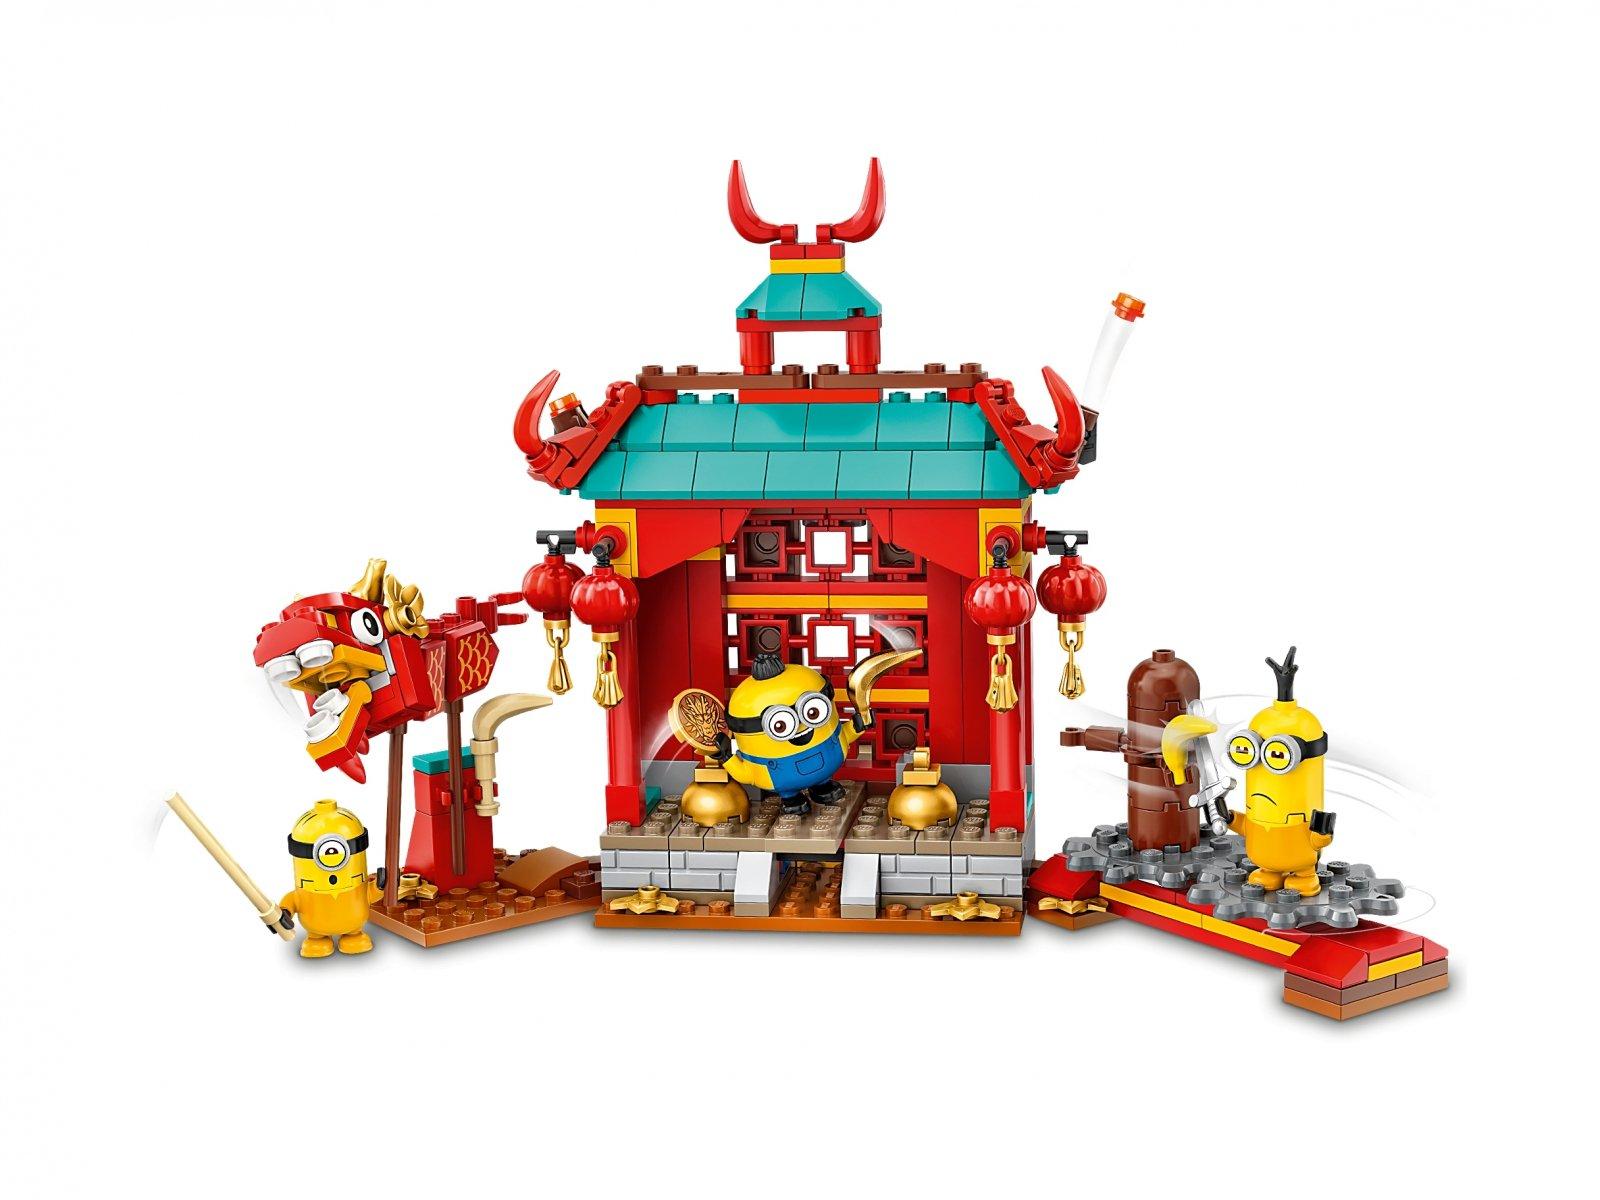 LEGO 75550 Minionki i walka kung-fu